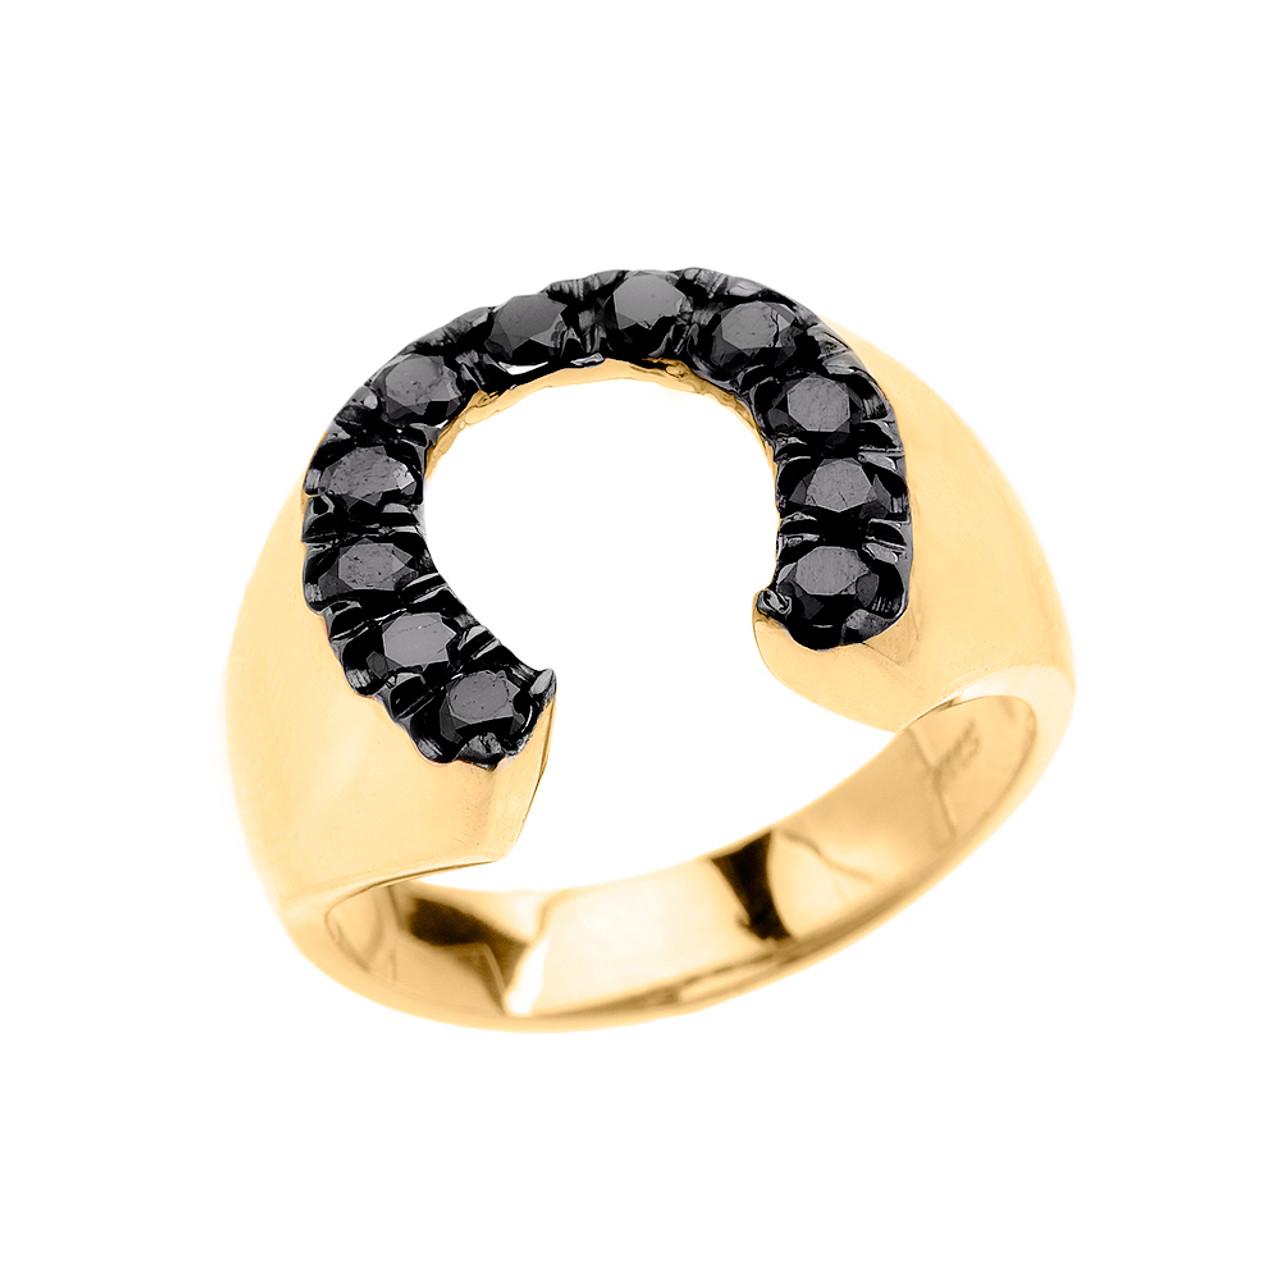 00f3efd3397aa Yellow Gold Black Diamond Horseshoe Lucky Men's Ring